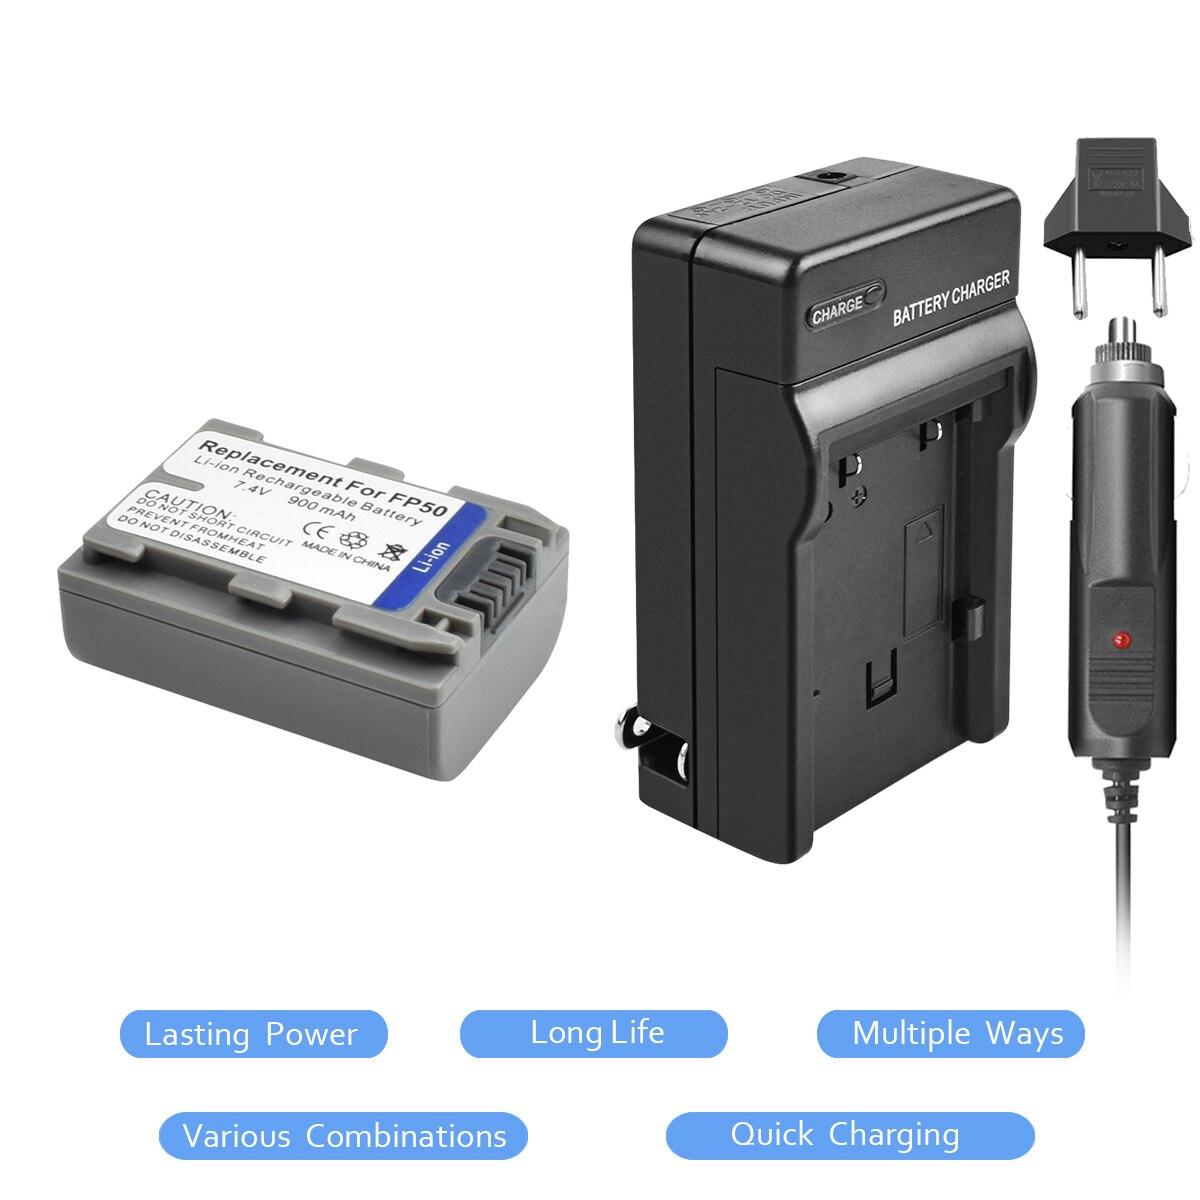 Battery Replacement for Sony DCR-DVD105 DCR-DVD105E DCR-DVD203 DCR-DVD205 DCR-DVD205E DCR-DVD305 DCR-DVD403 Record